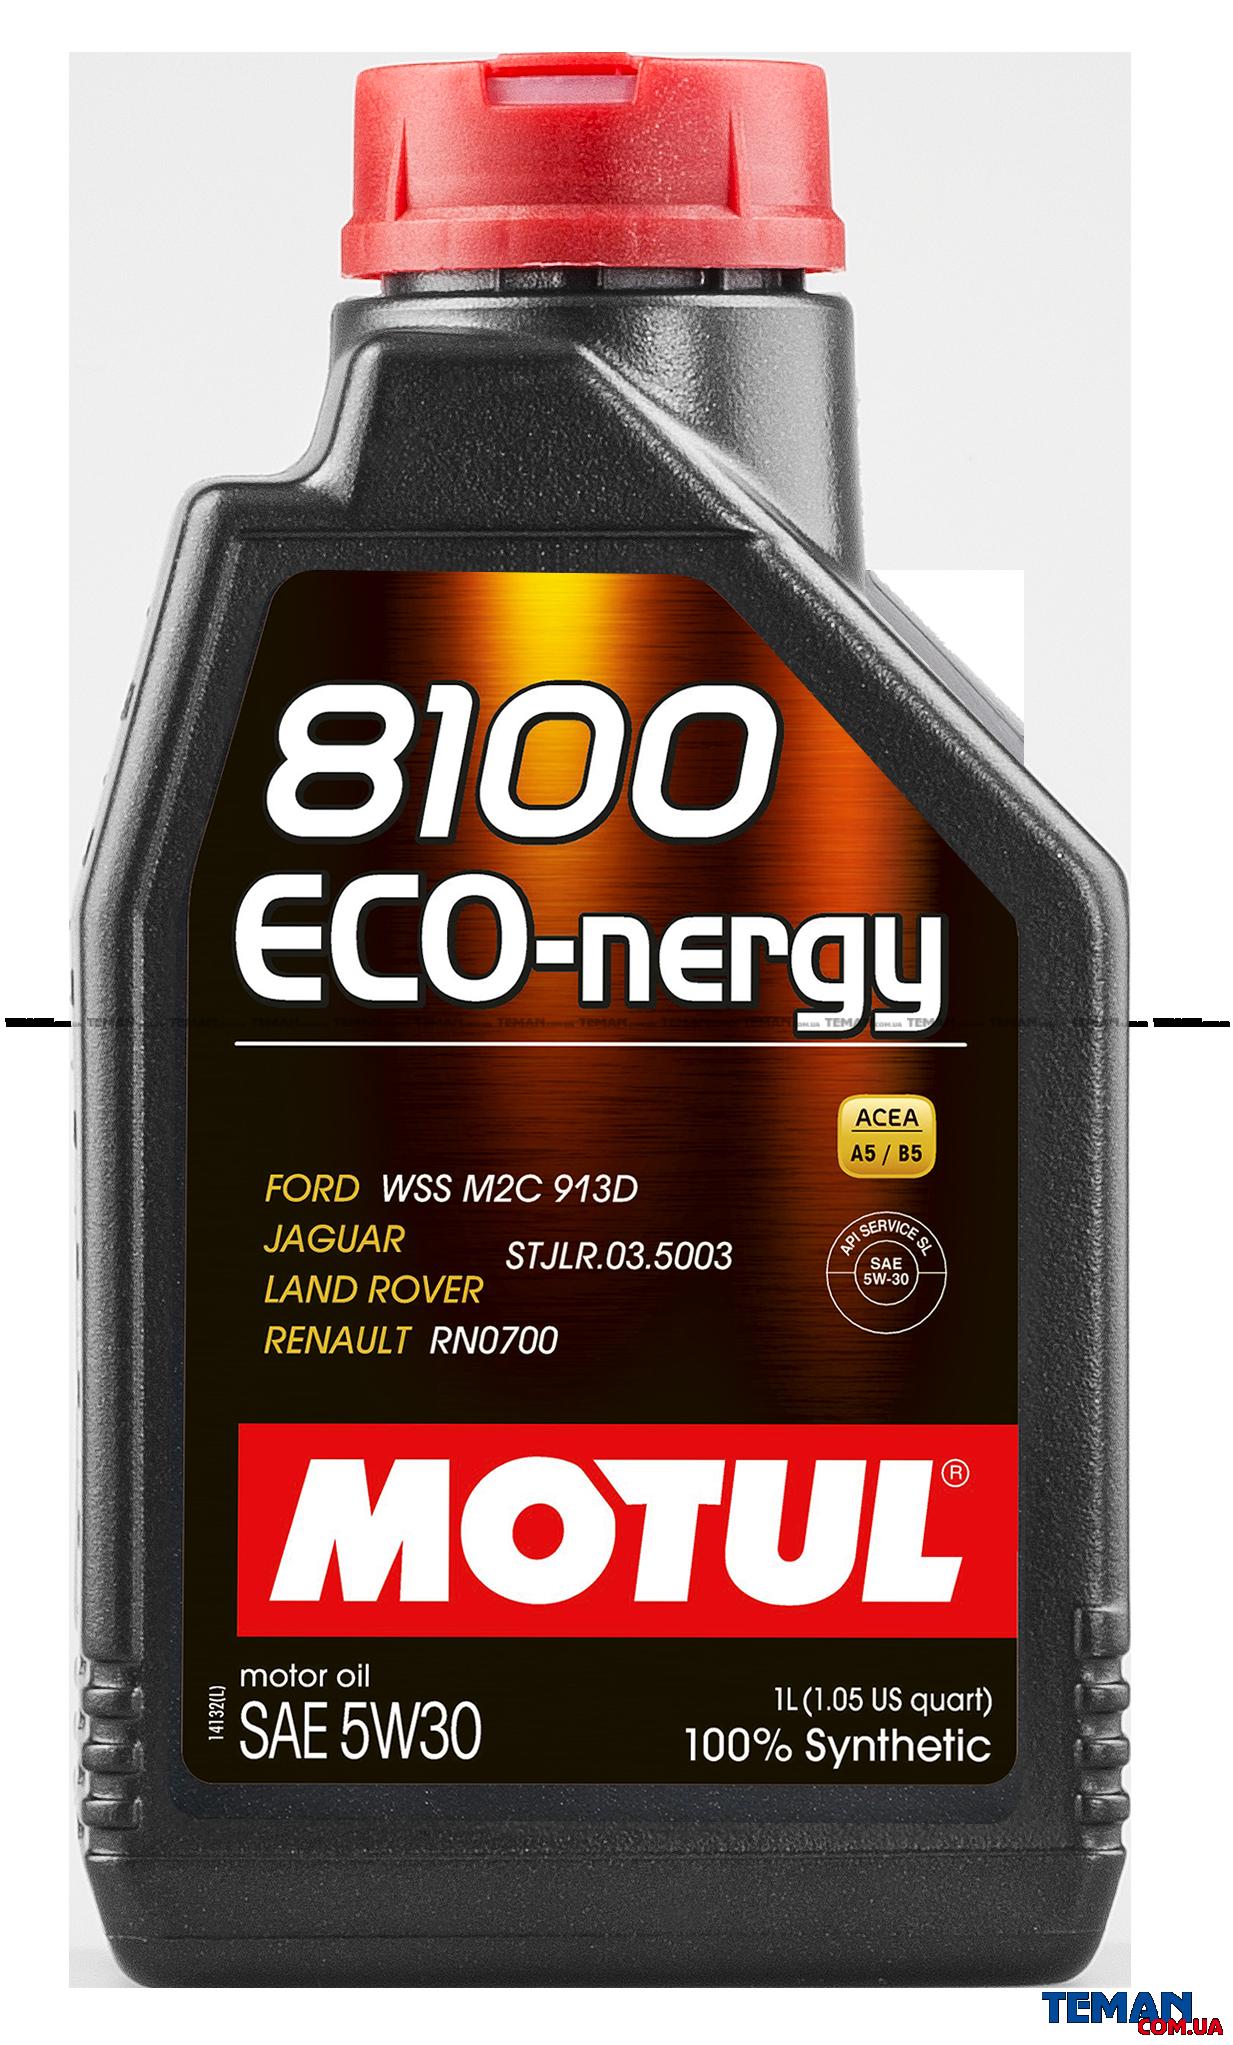 Синтетическое моторное масло 8100 Eco-nergy SAE 5W30, 1 л